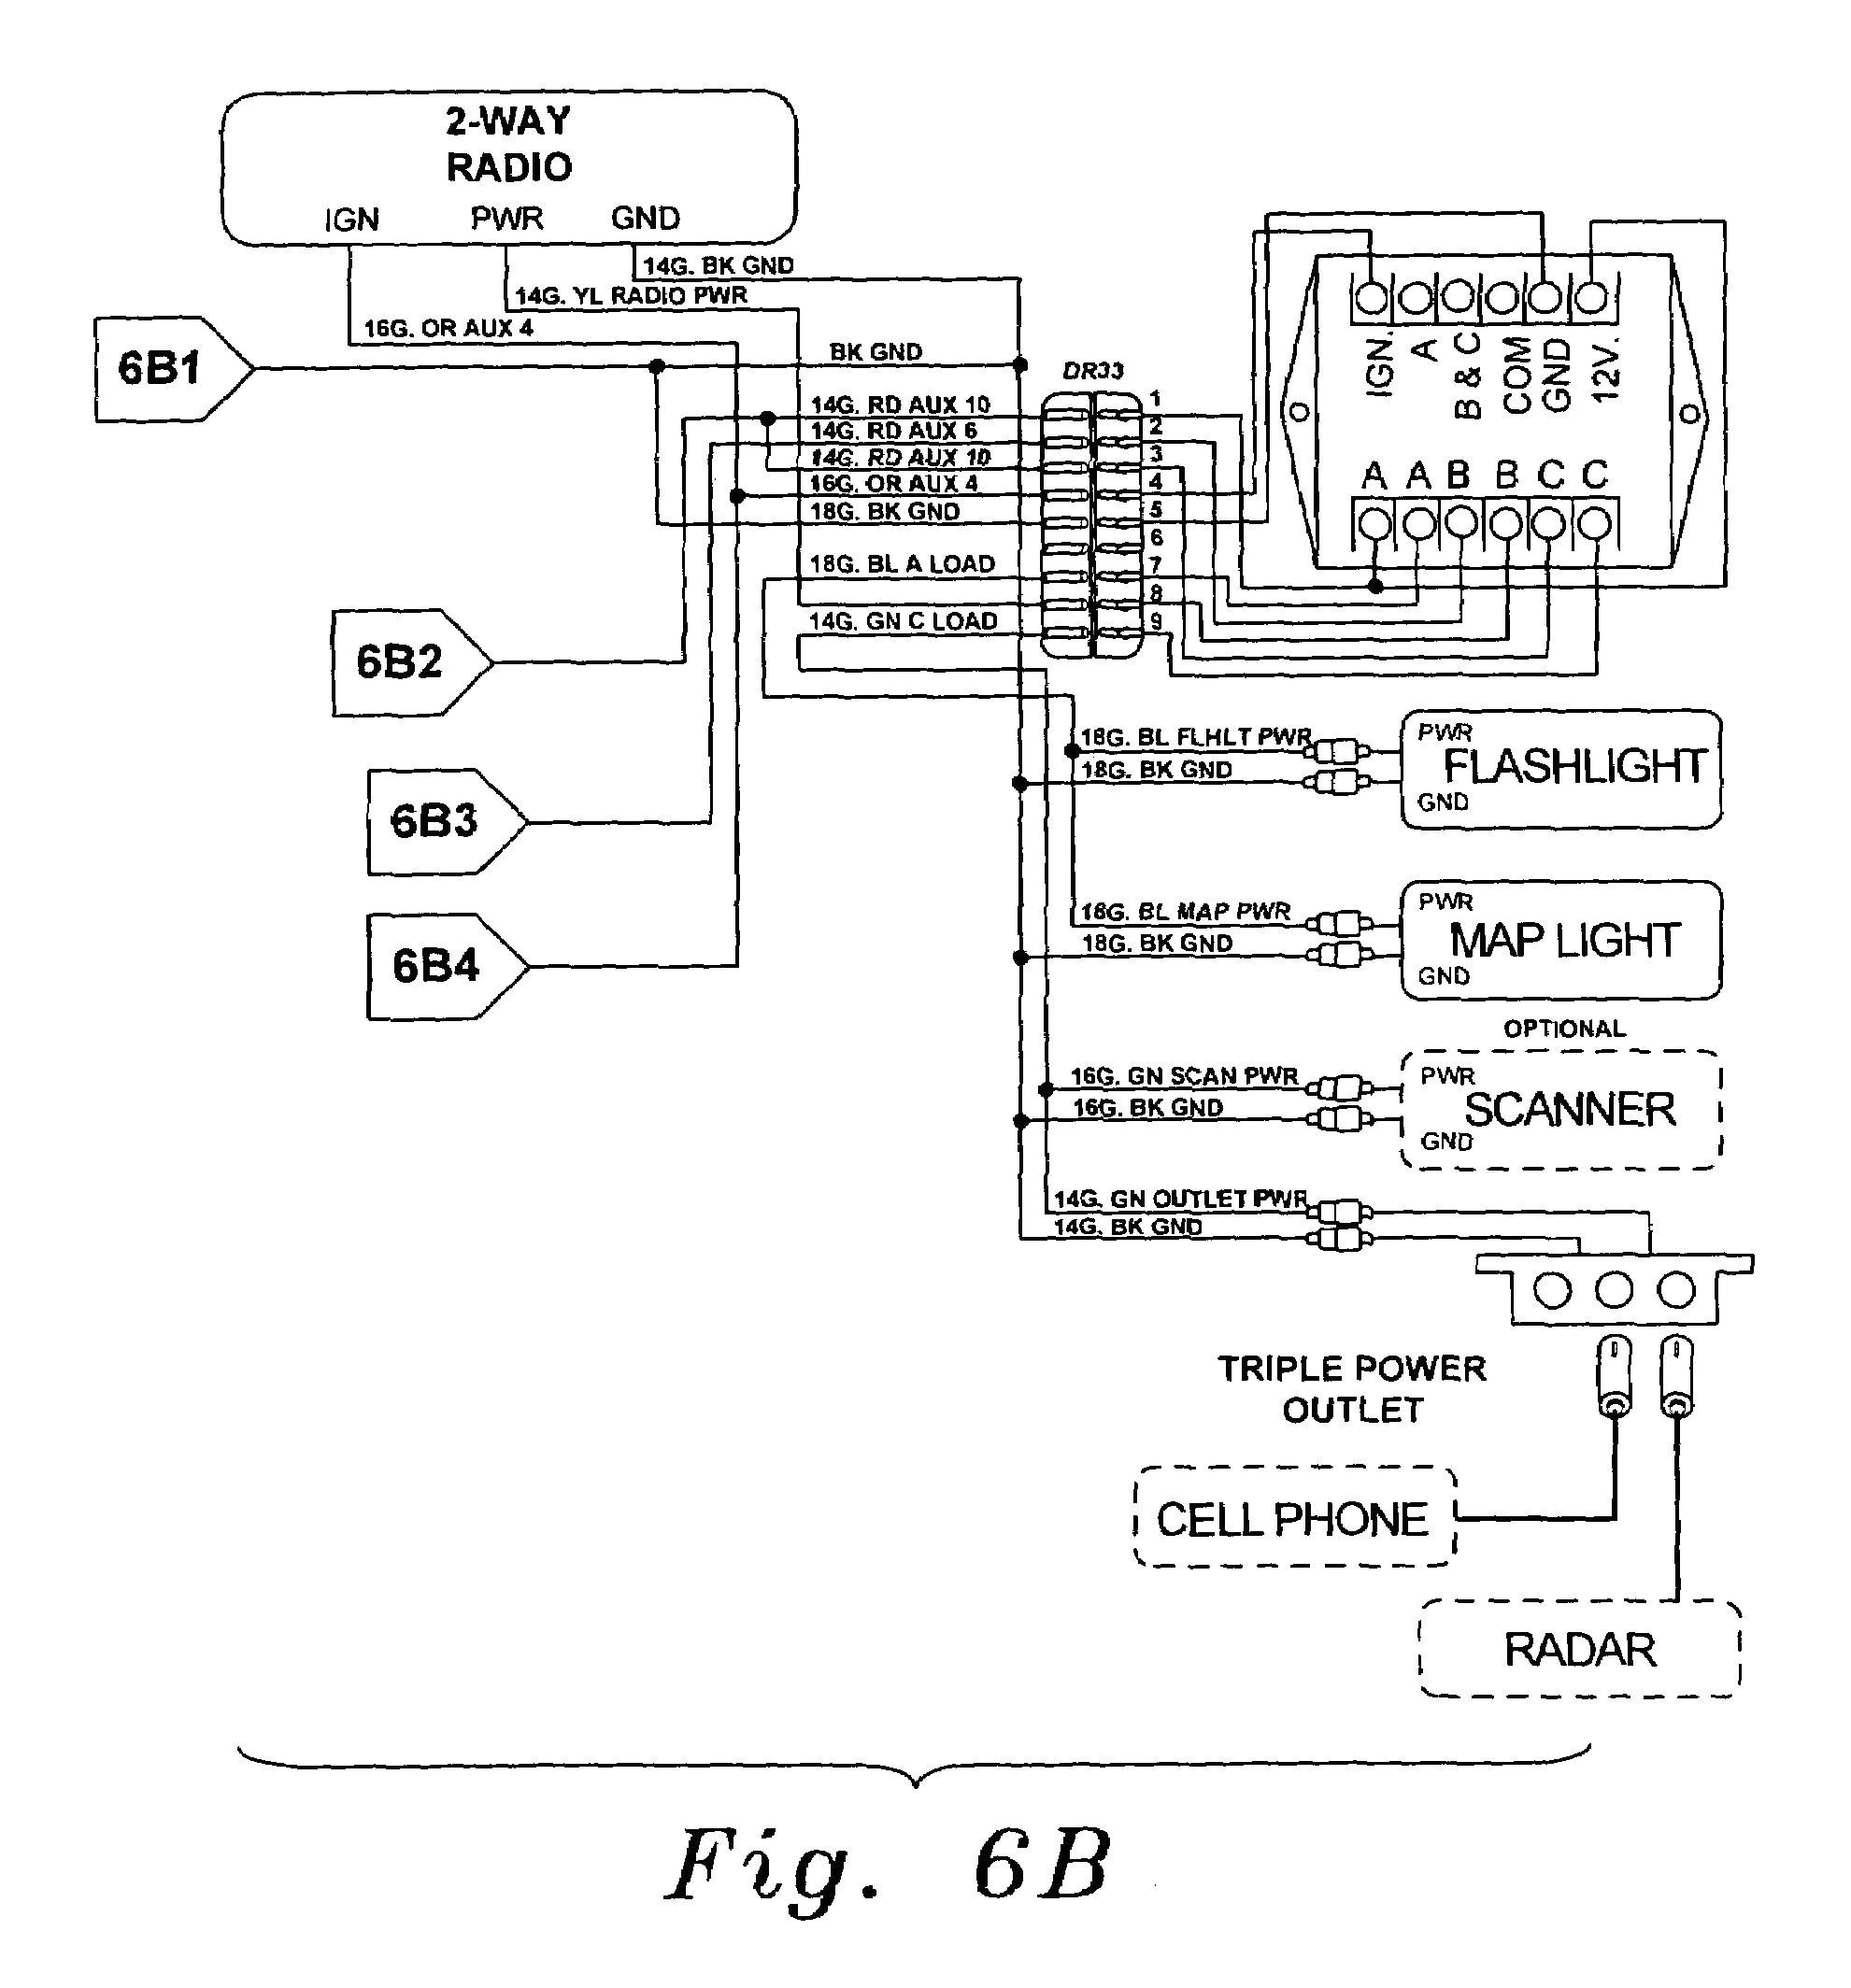 whelen edge 9000 wiring harness data wiring diagram preview whelen edge ultra 9000 wiring diagram whelen edge 9000 wiring harness